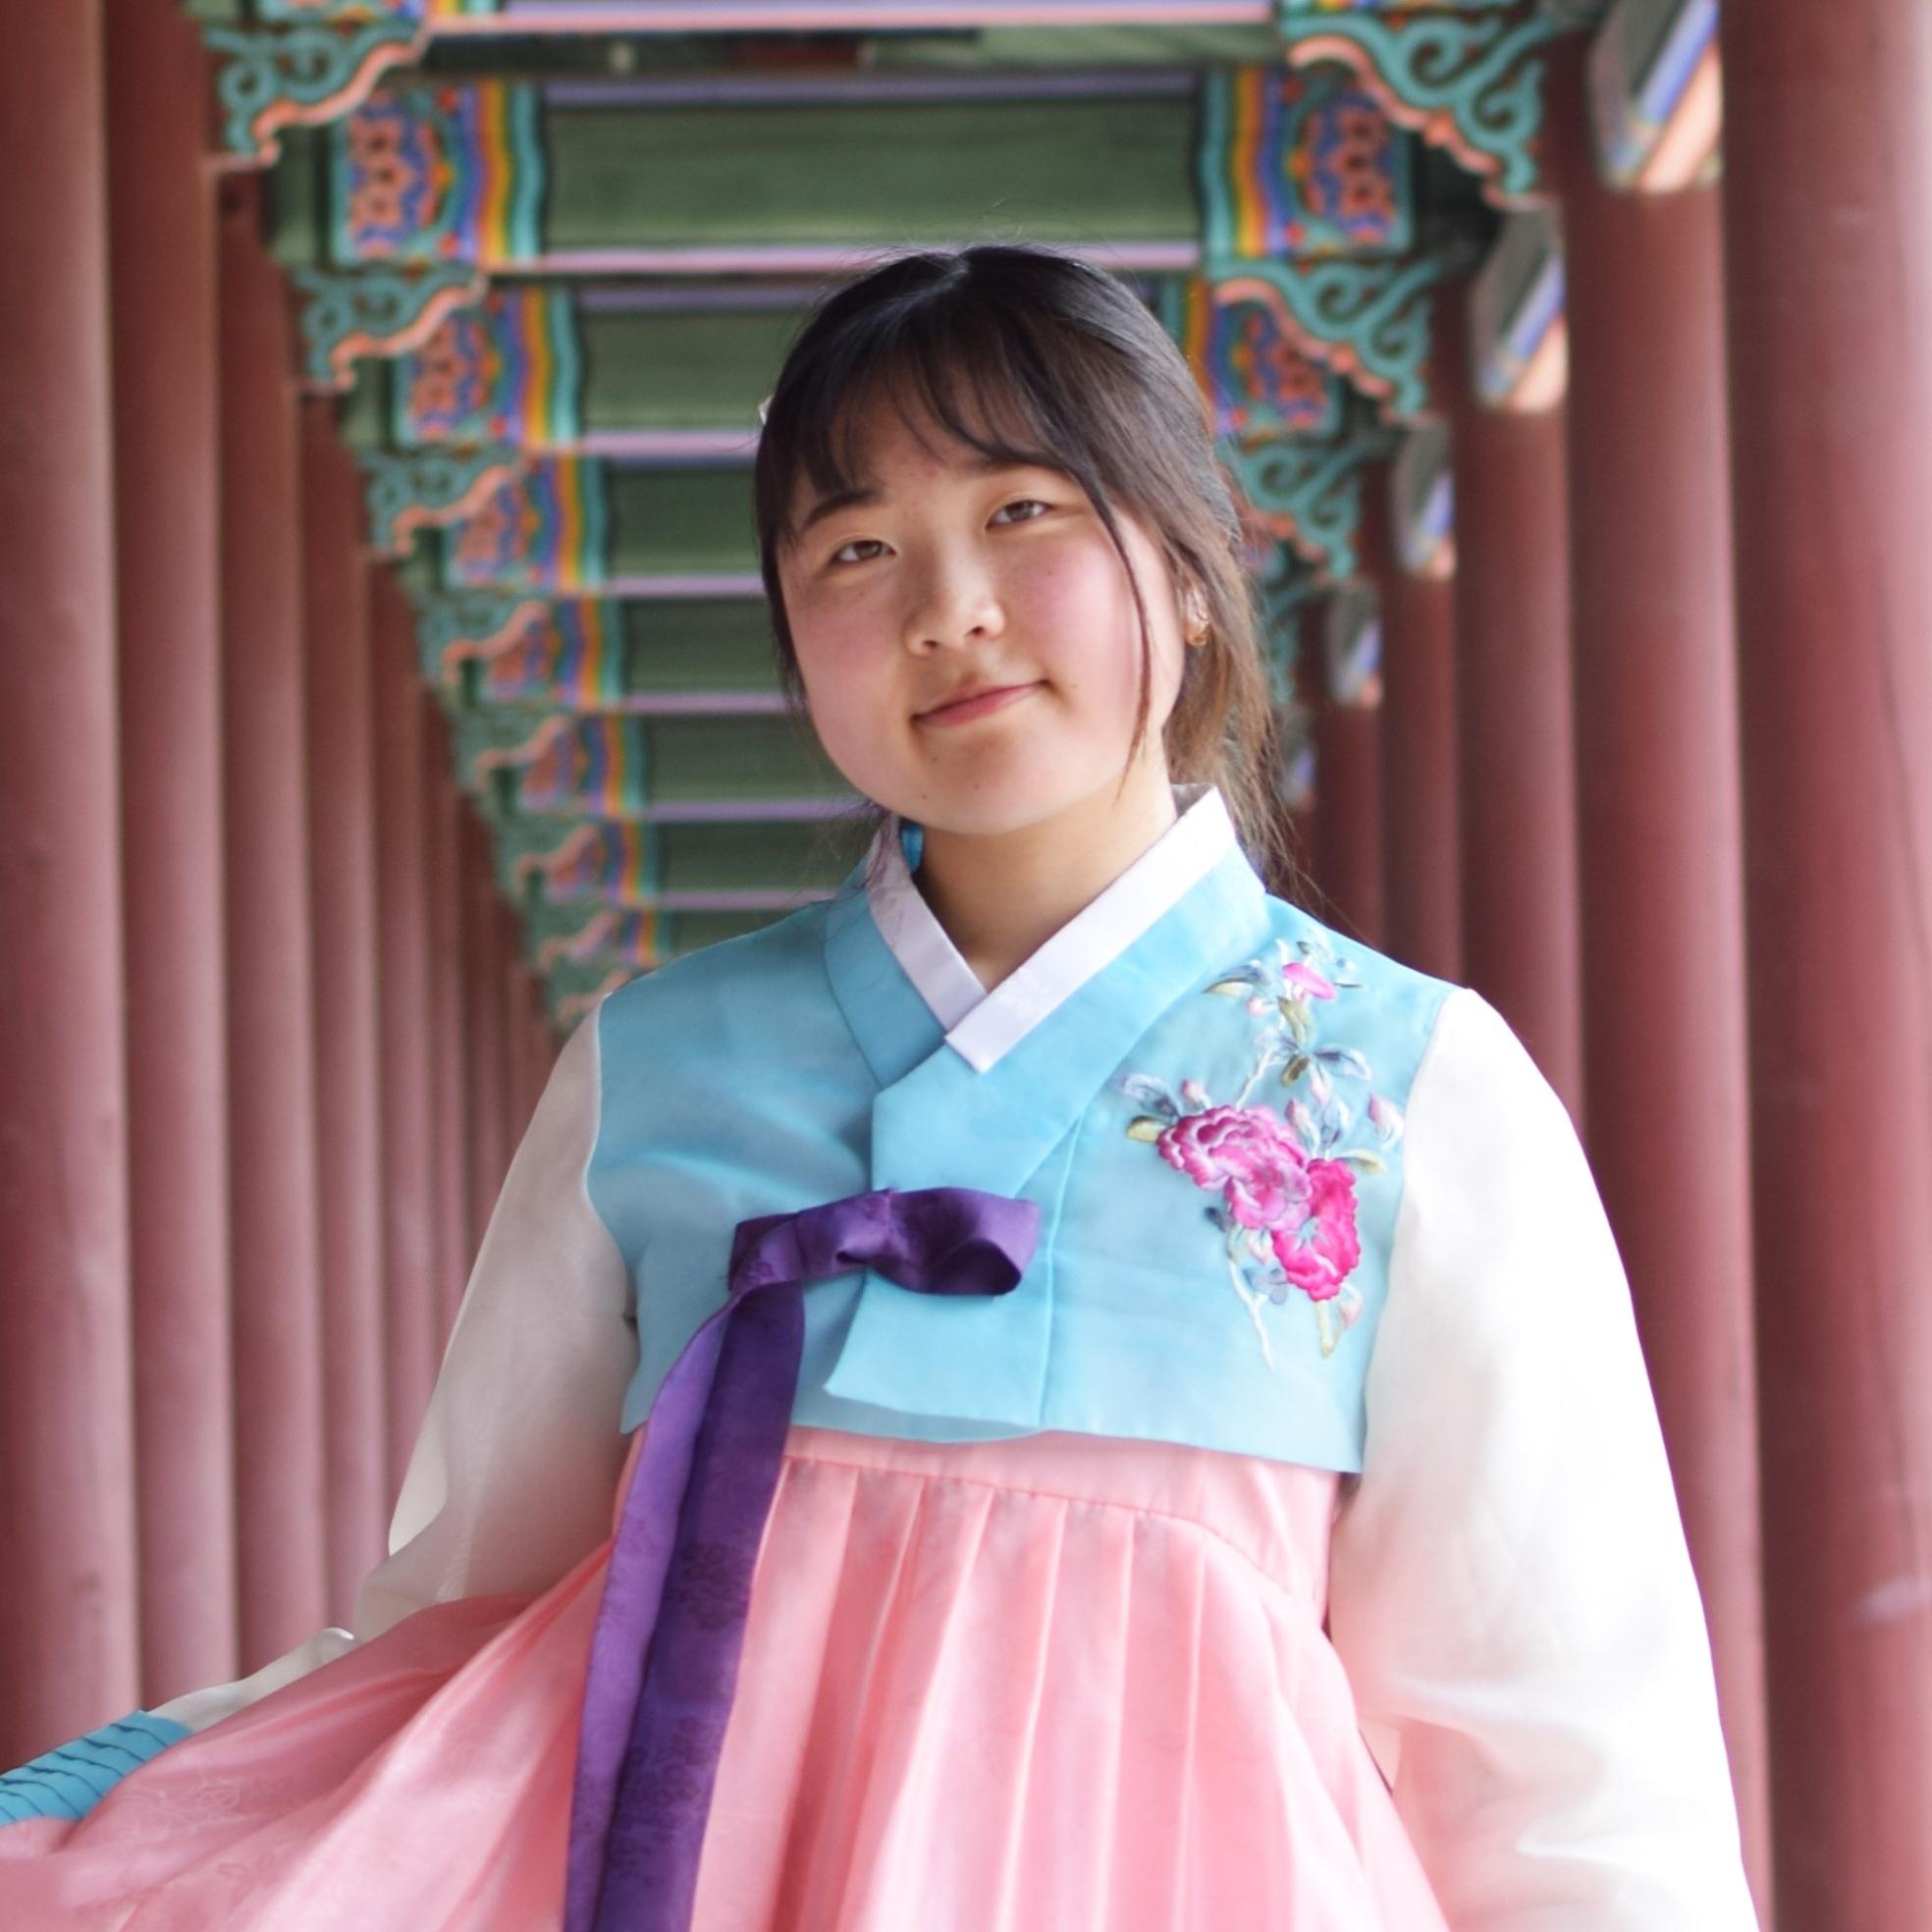 Mirei   Machiyama   18, studying software engineering at Cal Poly (SLO)